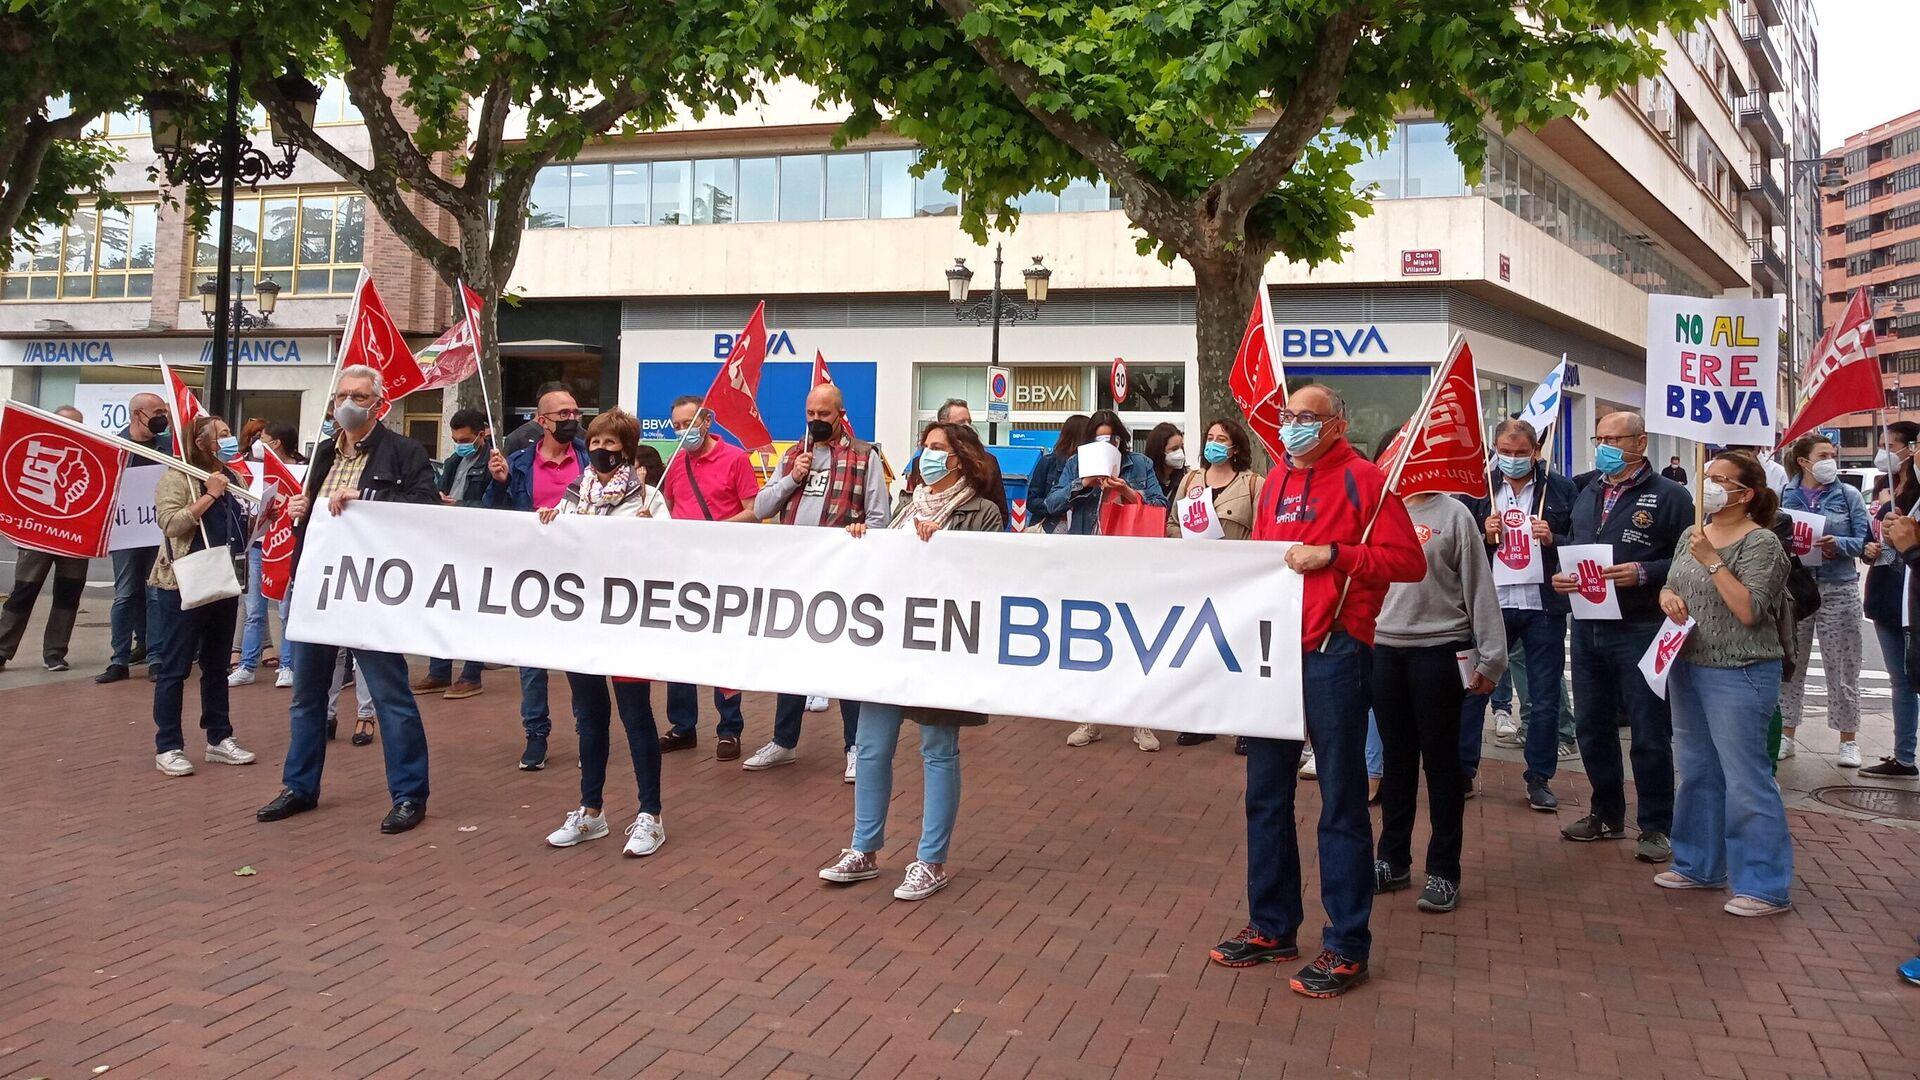 La huelga de los trabajadores de BBVA - Sputnik Mundo, 1920, 02.06.2021